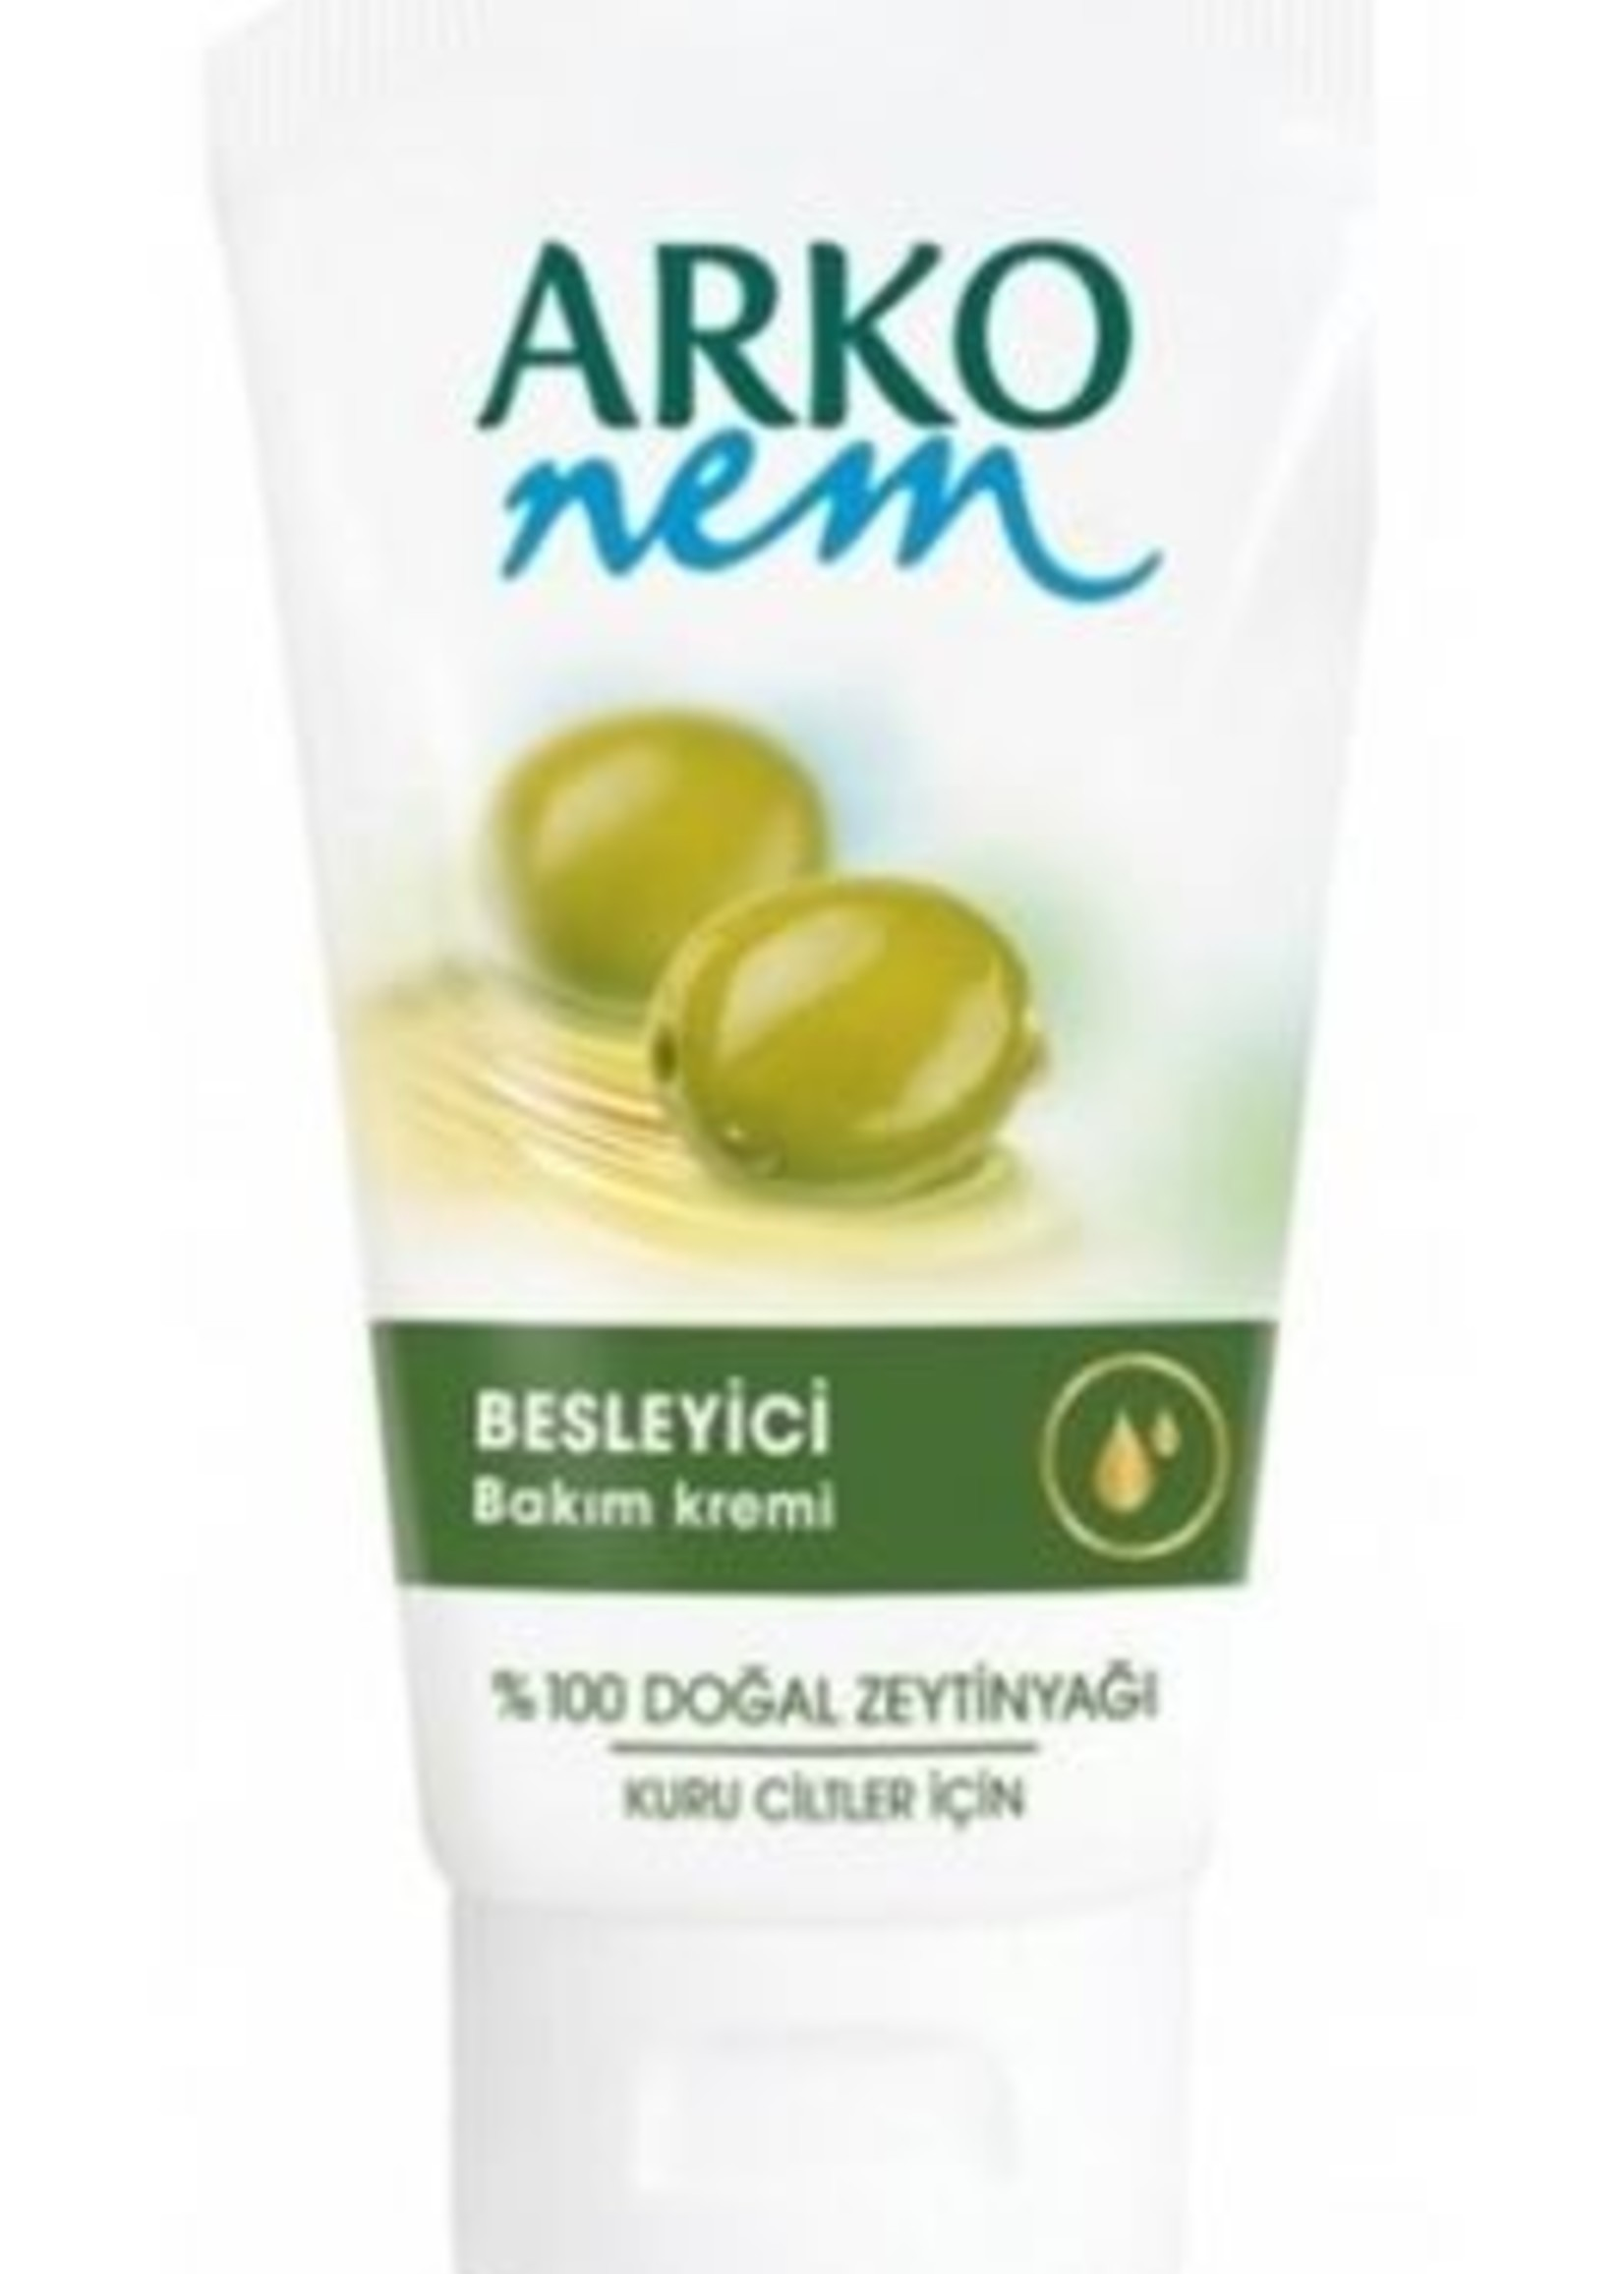 Arko Arko Creme Nem Olijfolie 60 ml